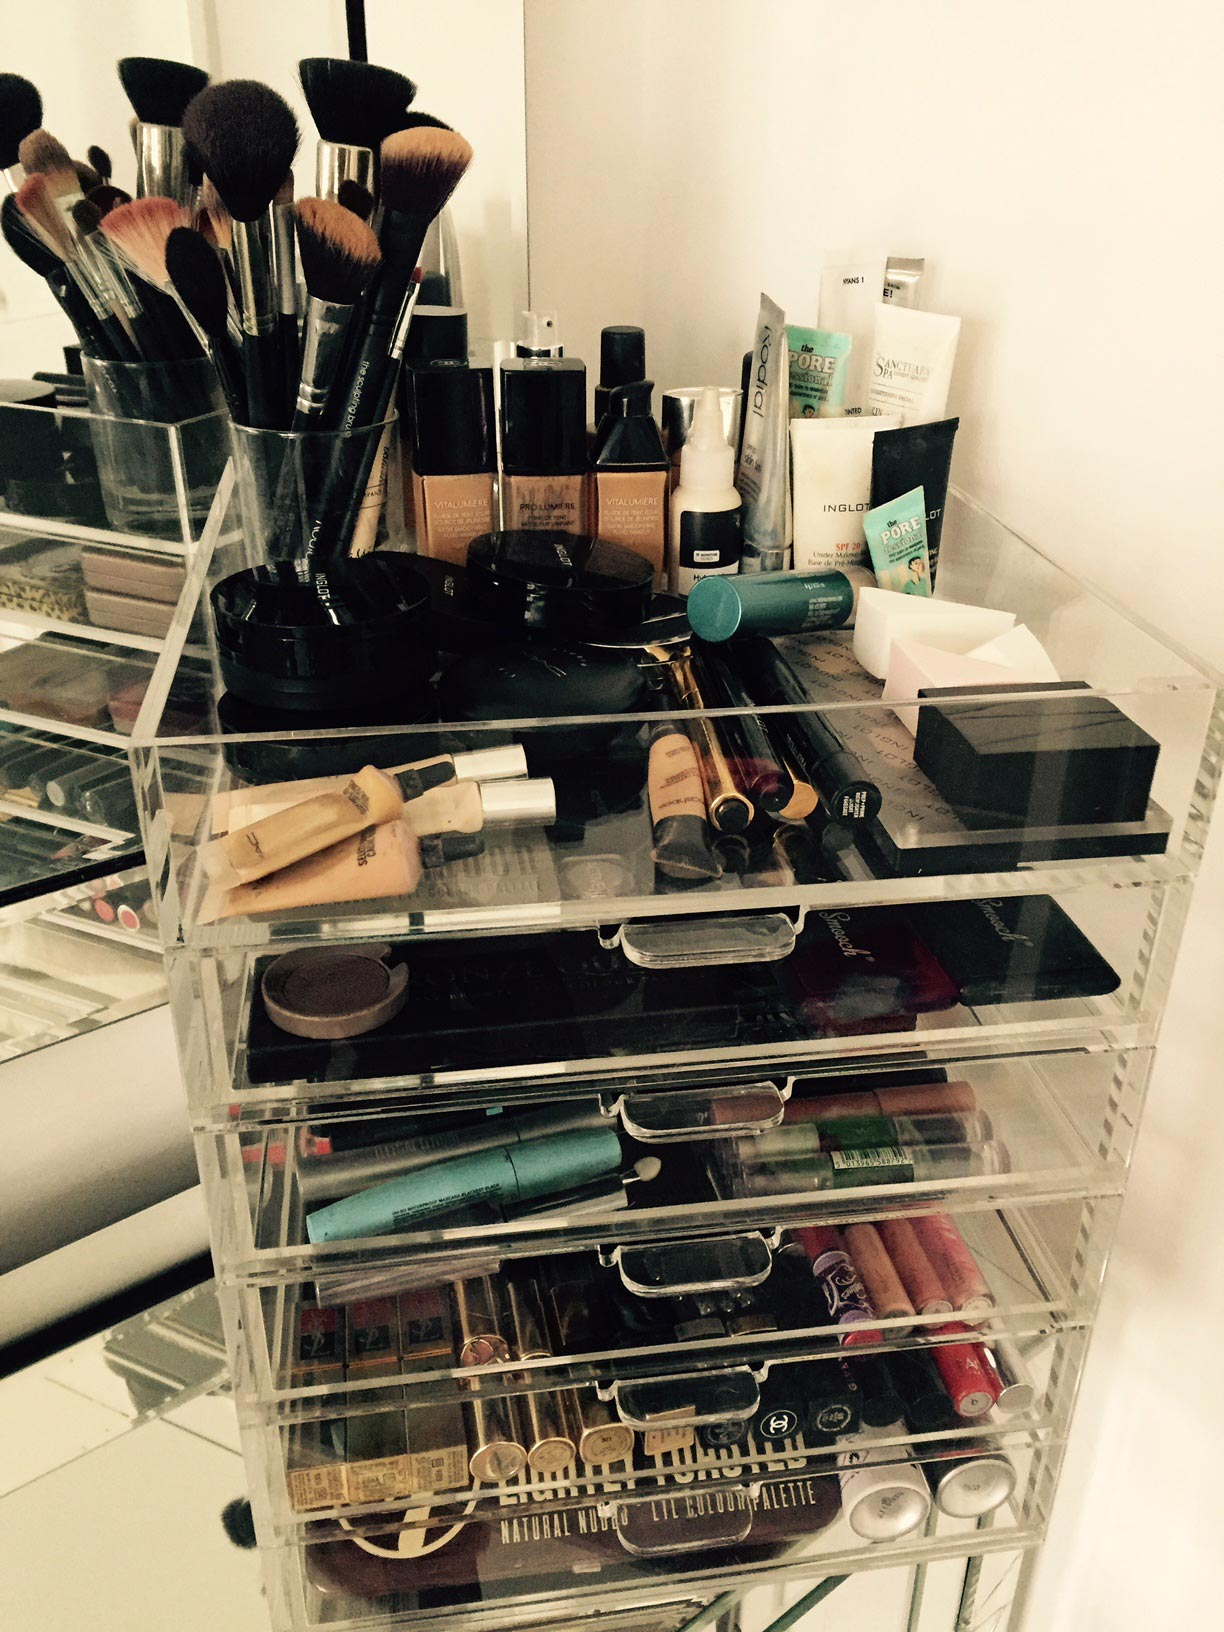 Luminati Acrylic Makeup Organiser | Ultimate Lifestylist